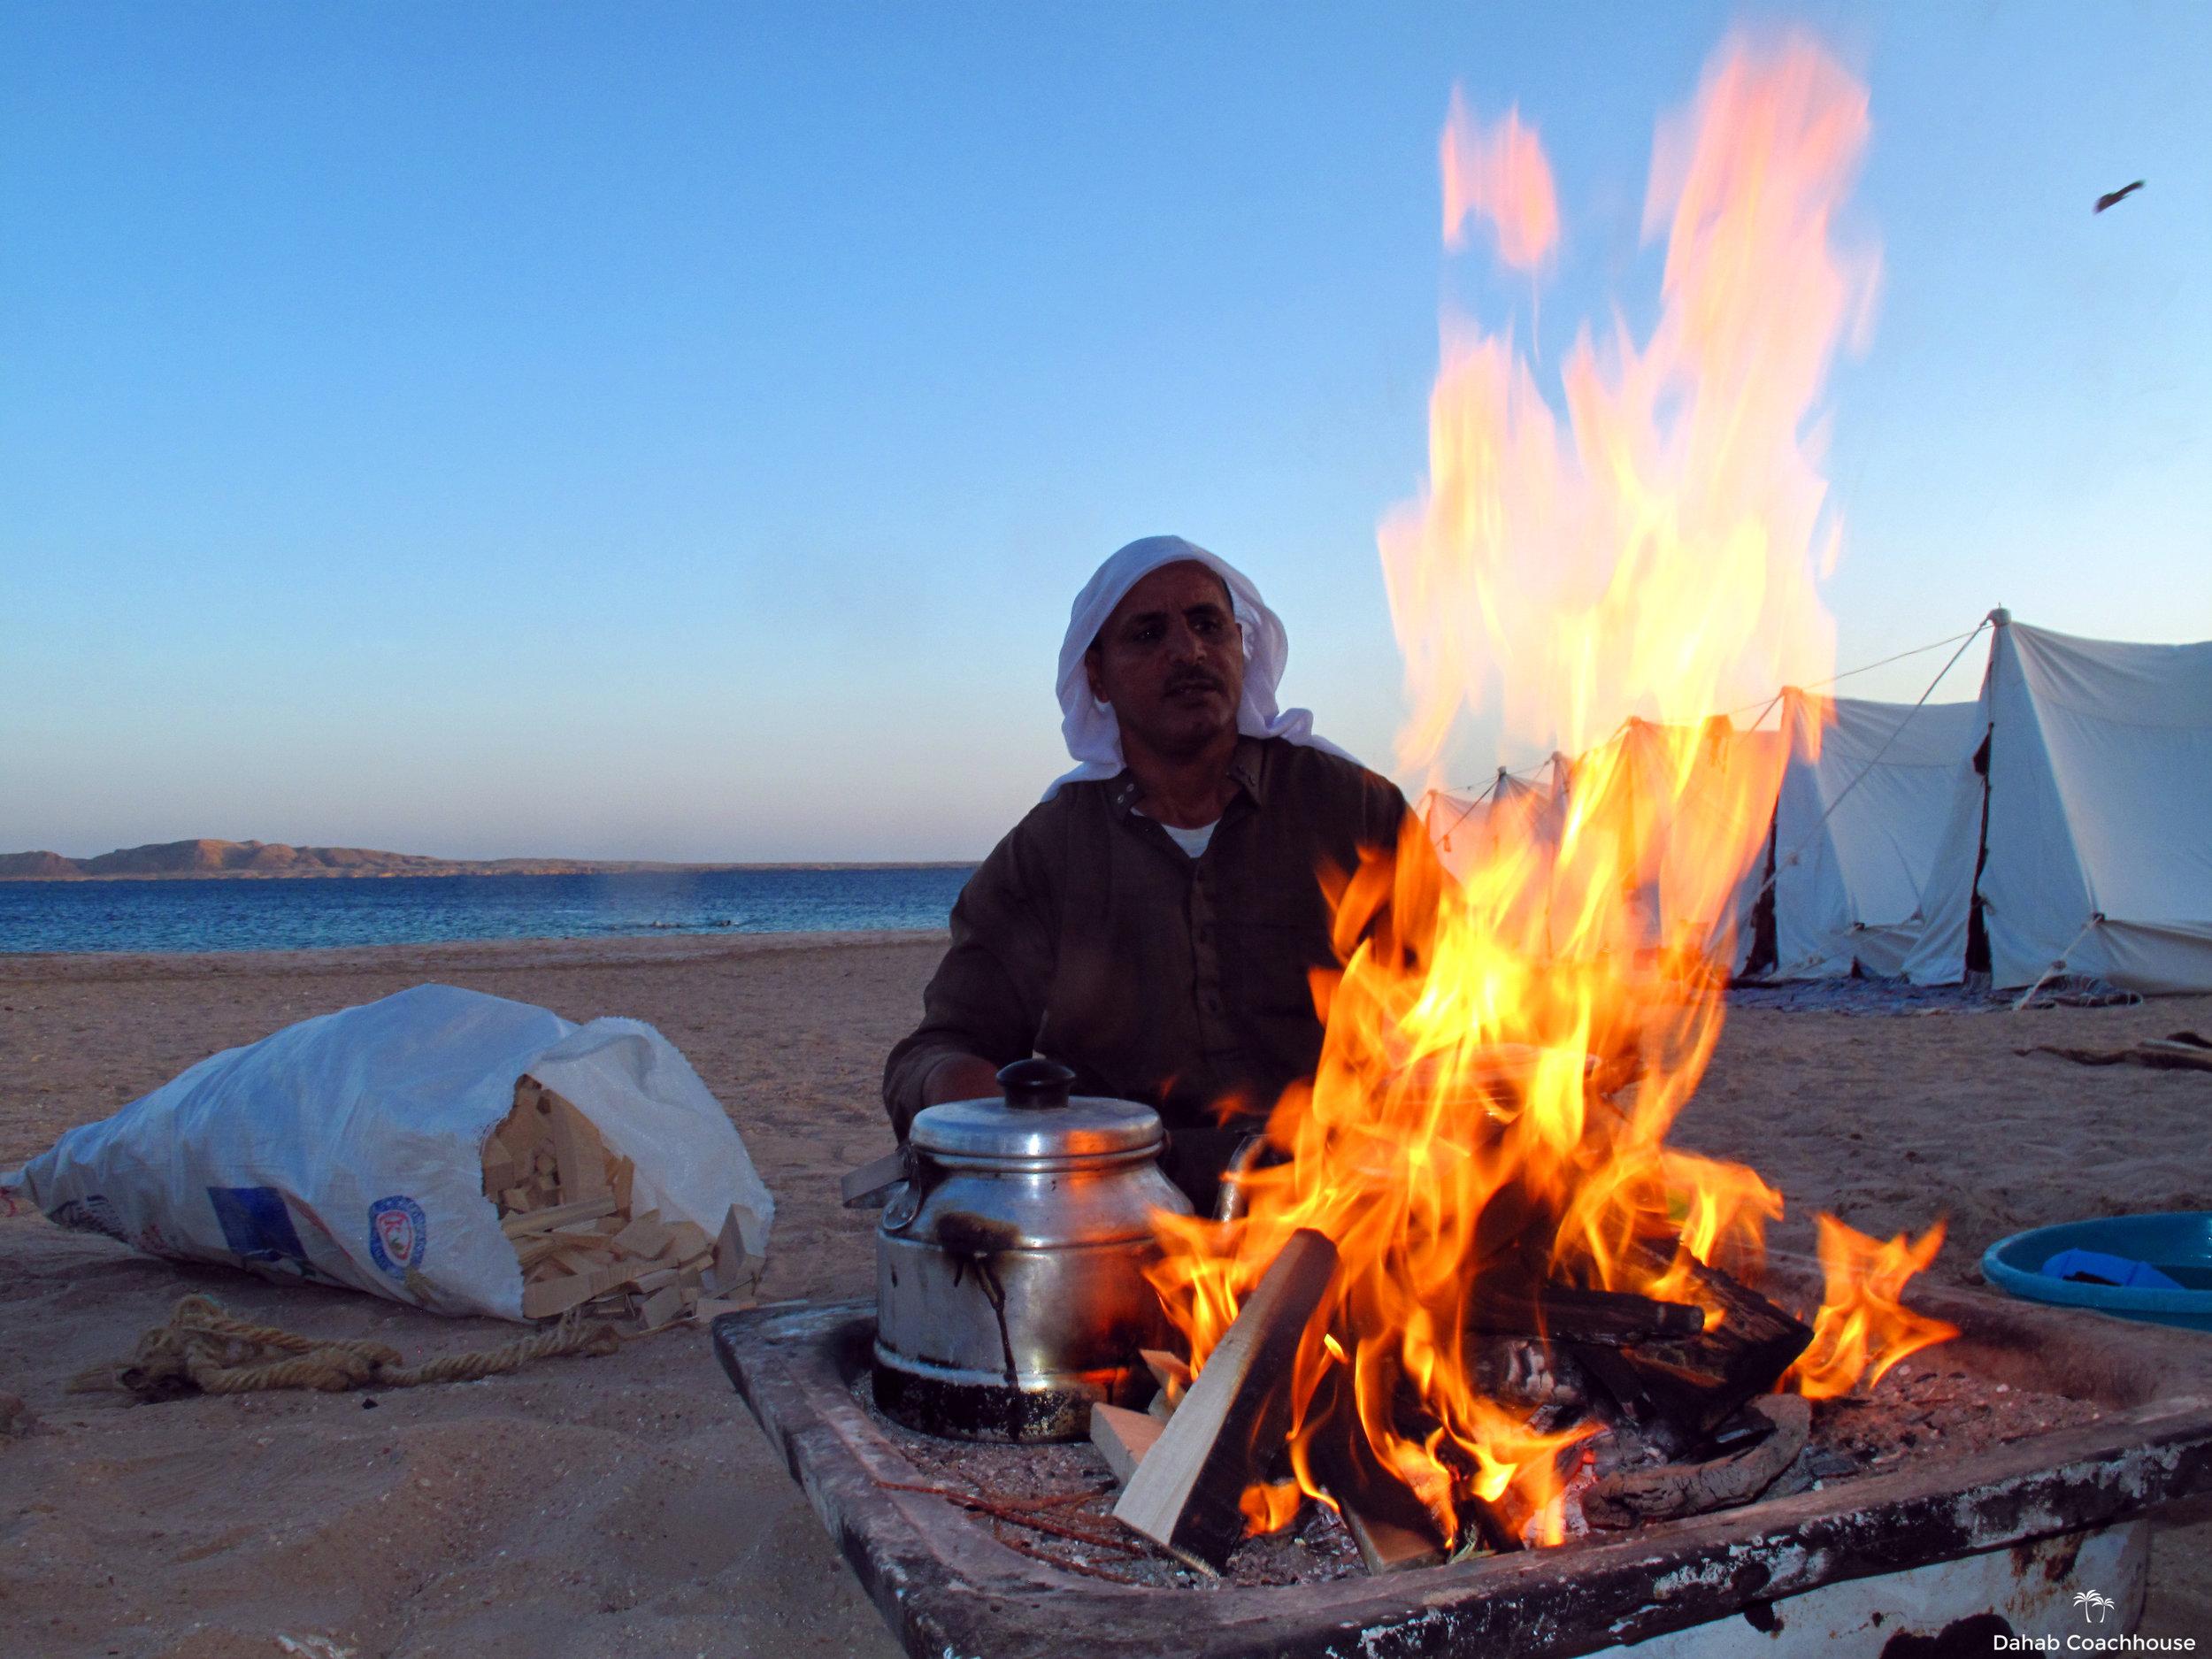 Dahab_Coachhouse_Sinai_Egypt_Dahab_Ras_Mohammed.JPG